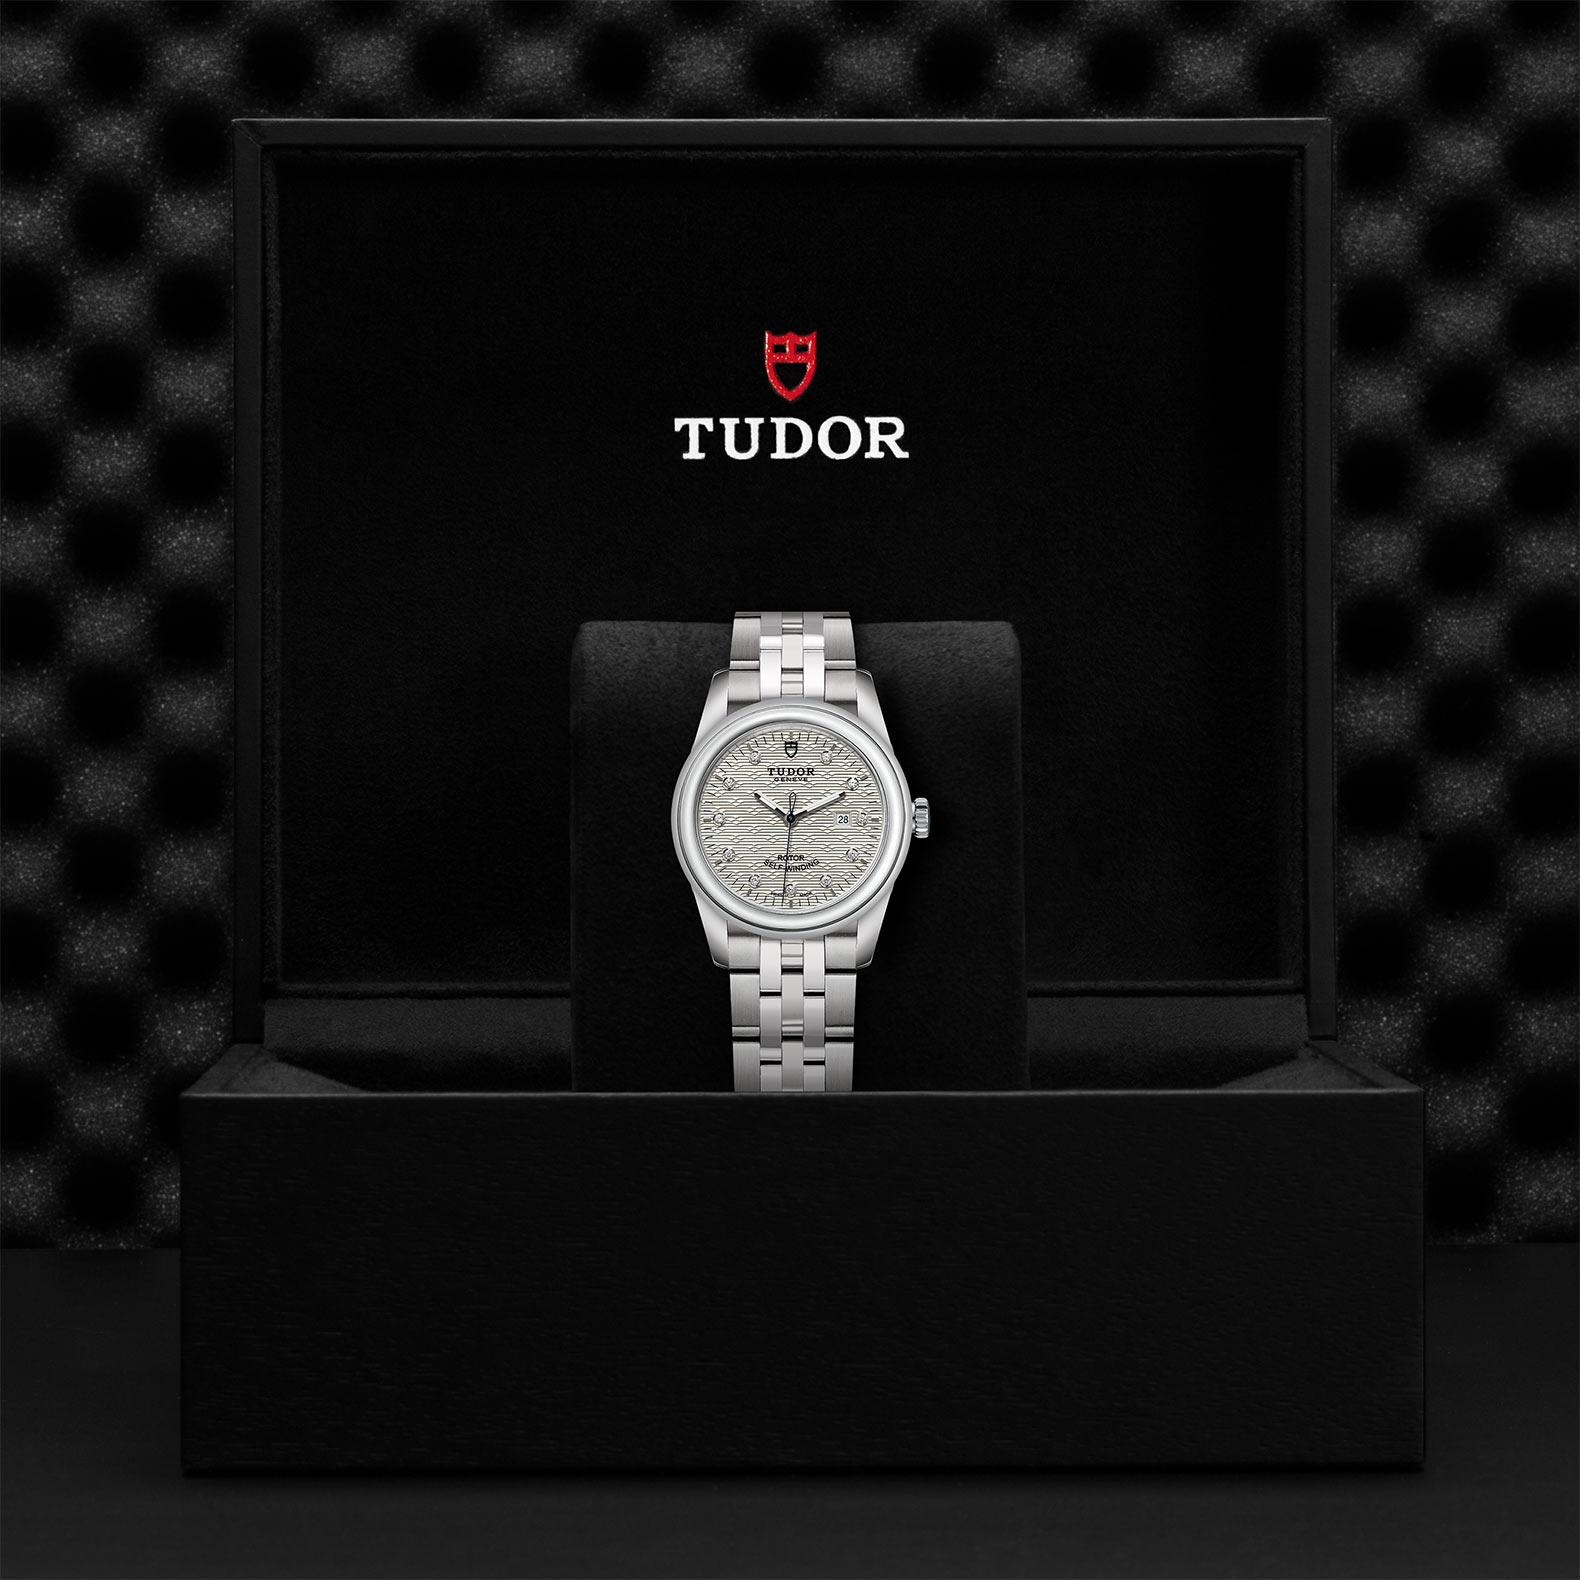 TUDOR Glamour Date - M53000-0009